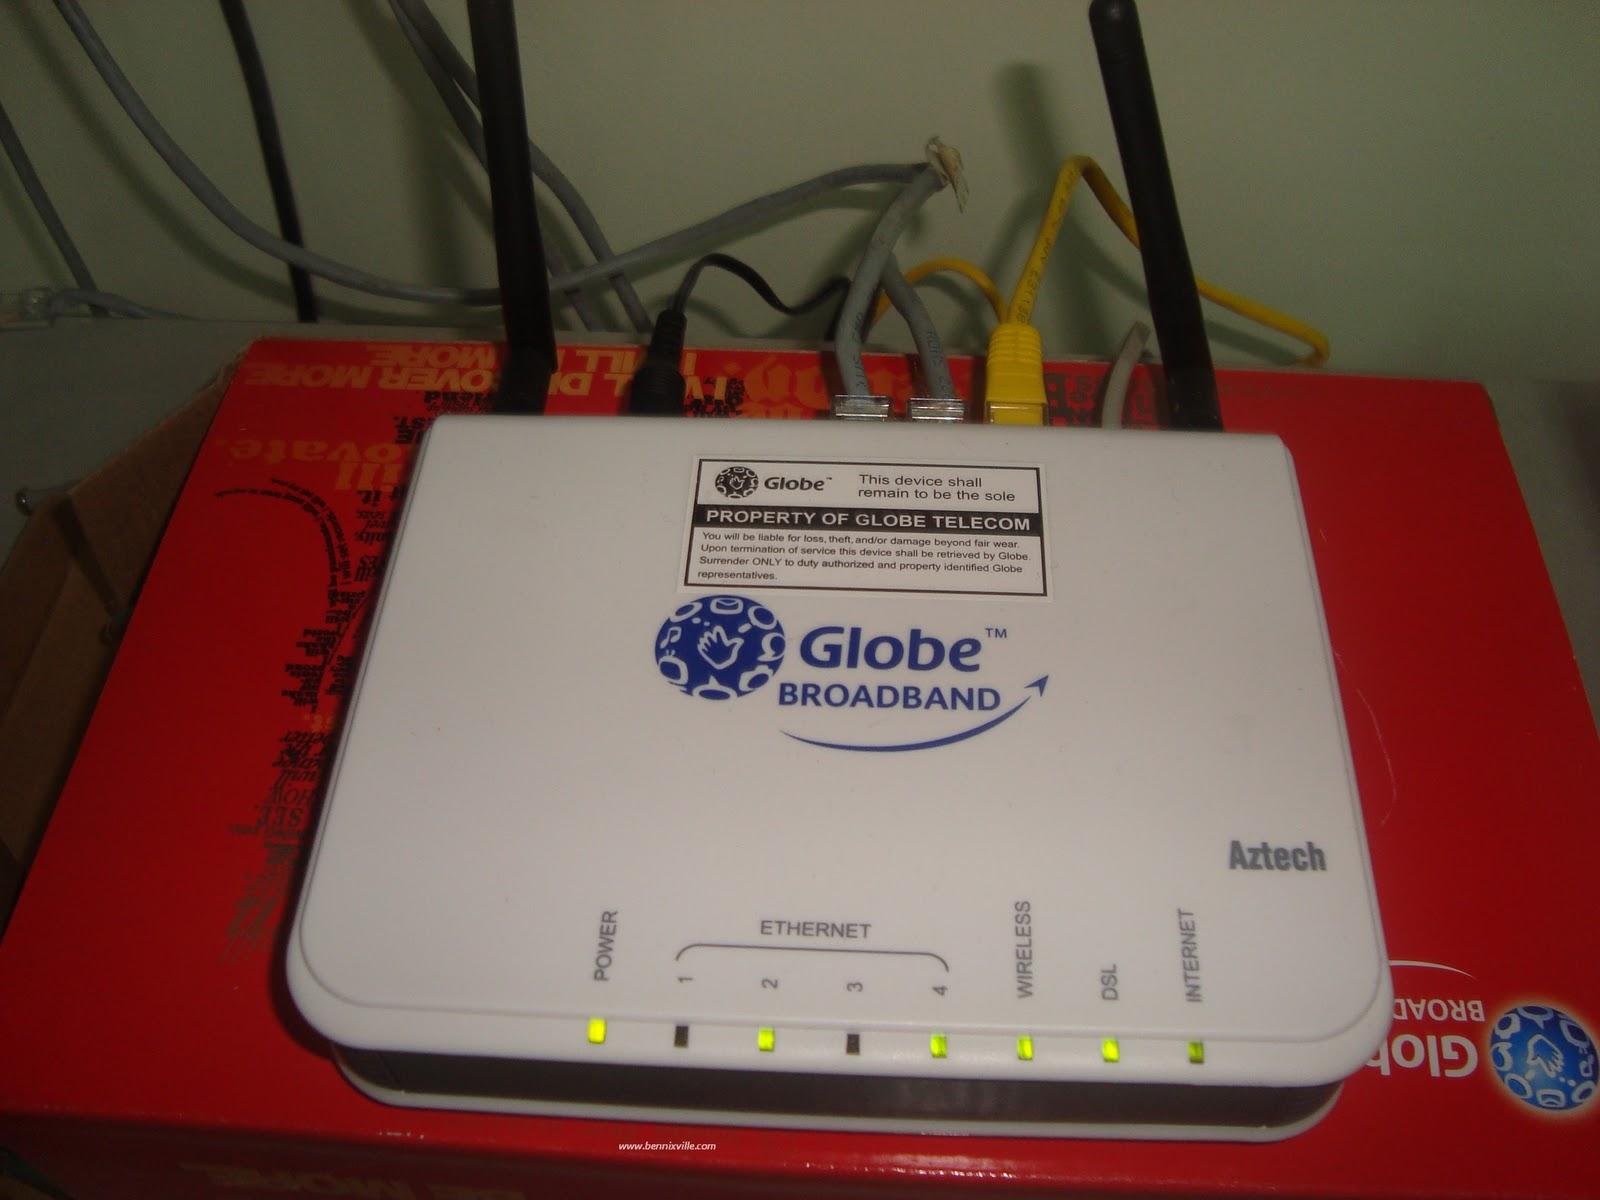 Globe Broadband Aztech Dsl605ew Modem Wifi Router Pros